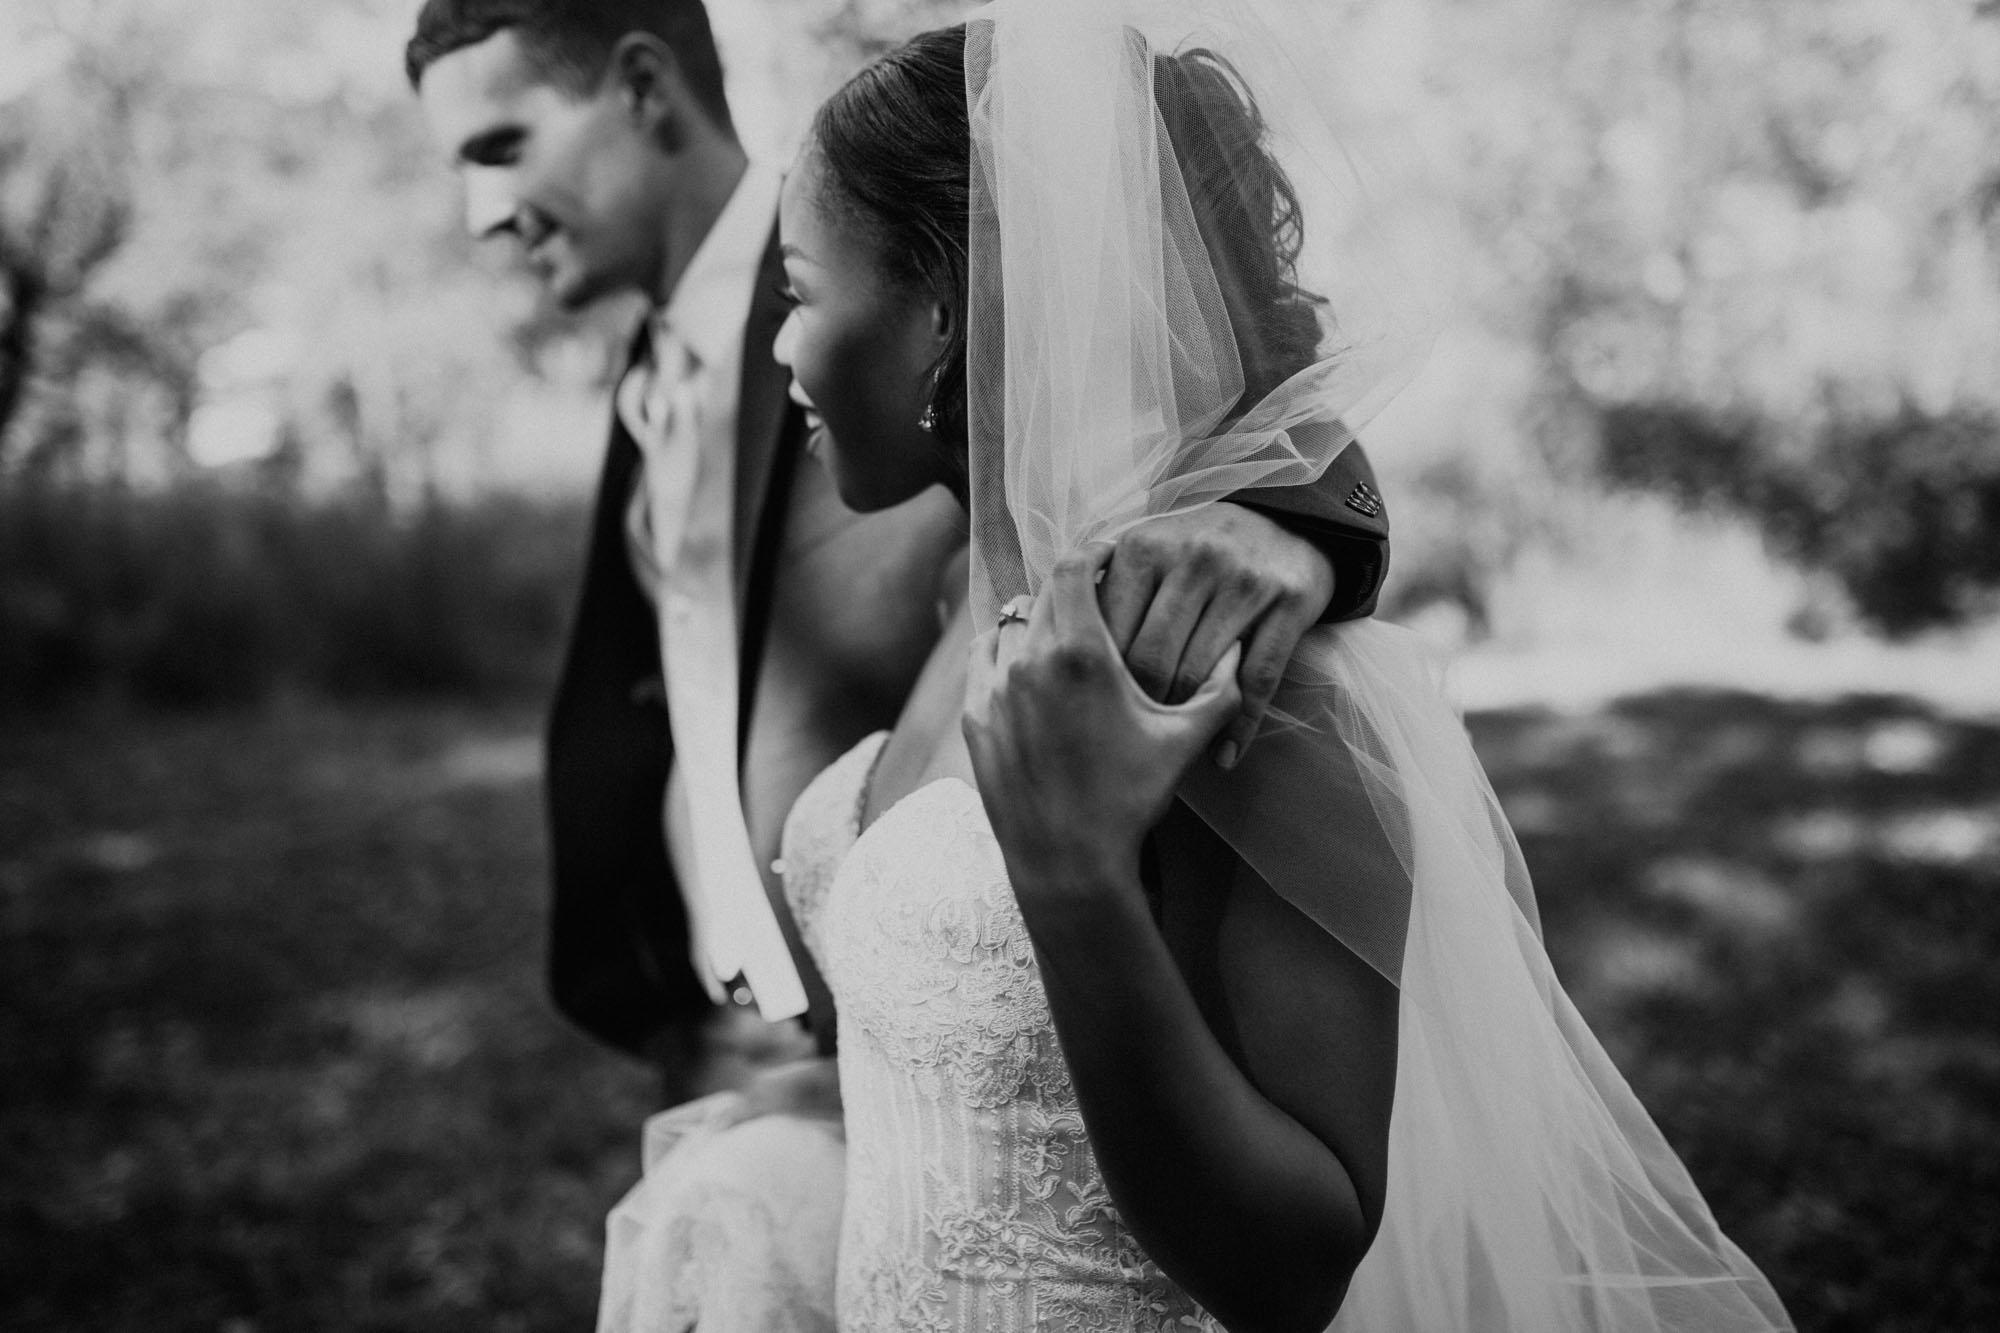 prairie_glass_house_wedding_champaign_wright_photographs_simon_0066.jpg